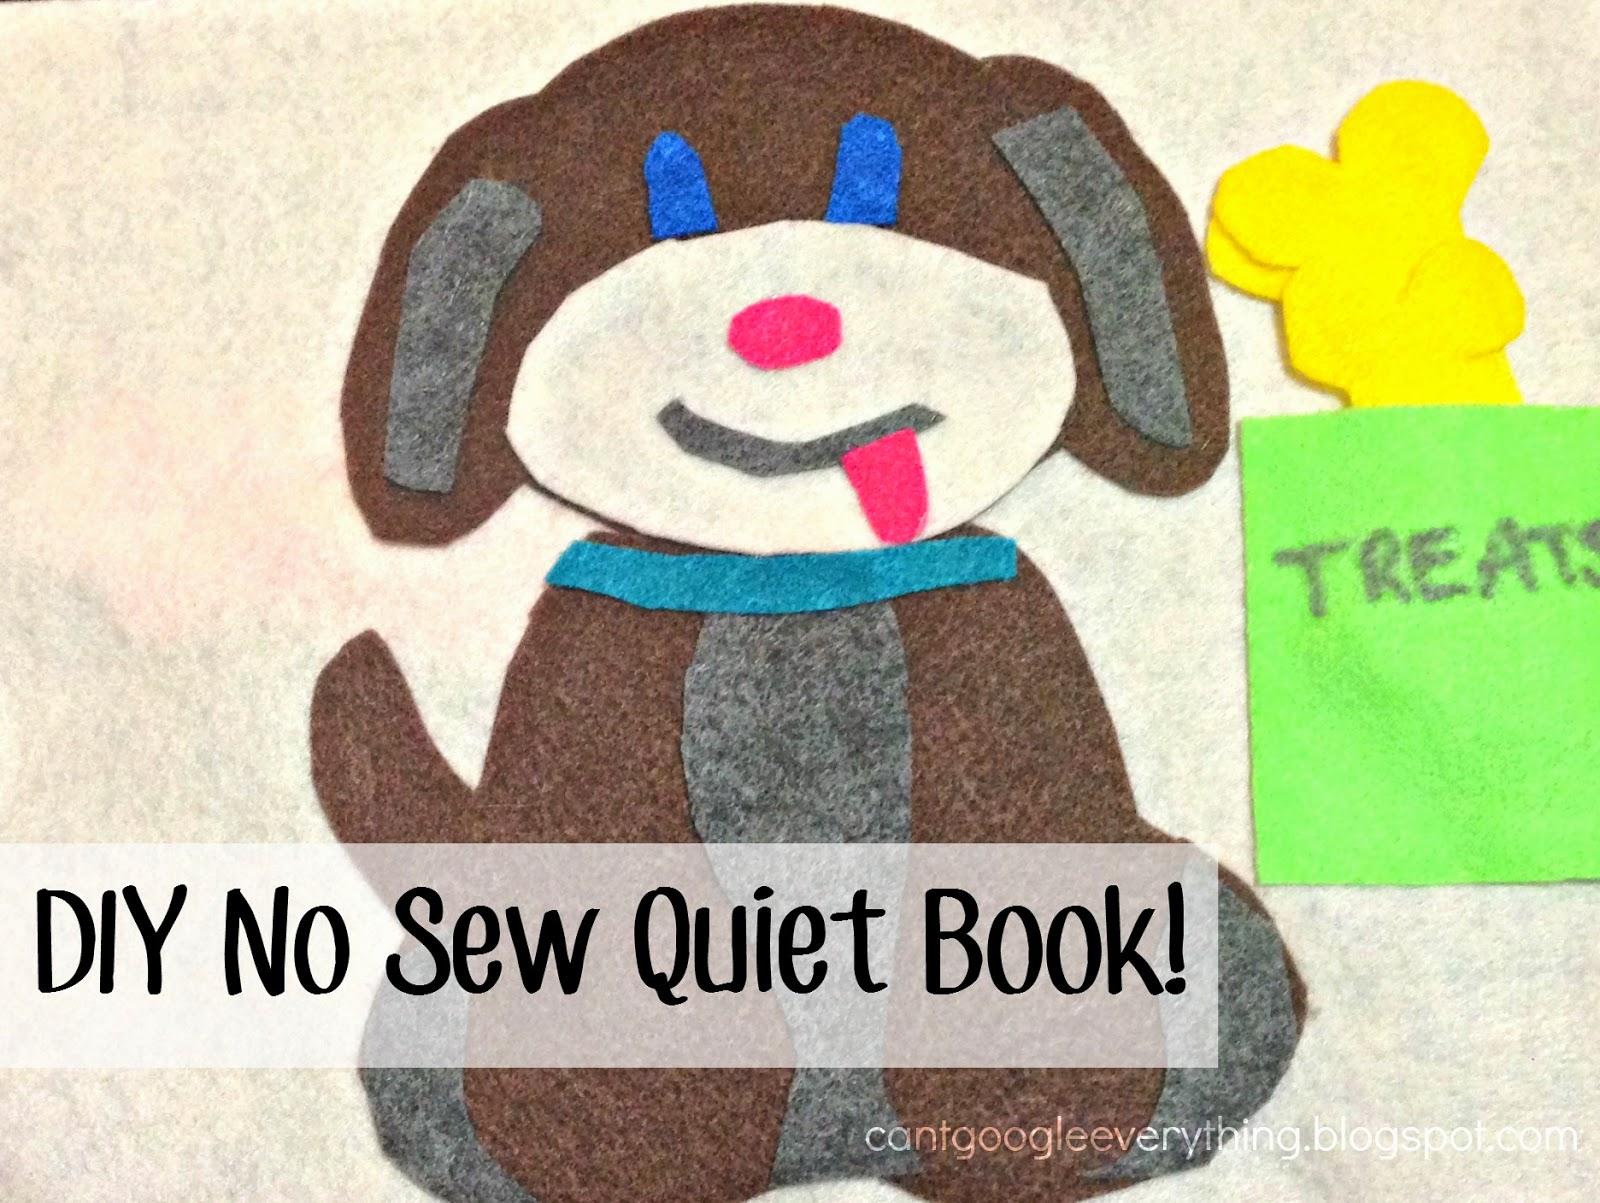 Diy Felt Book Cover ~ Diy no sew quiet book ideas my mini adventurer